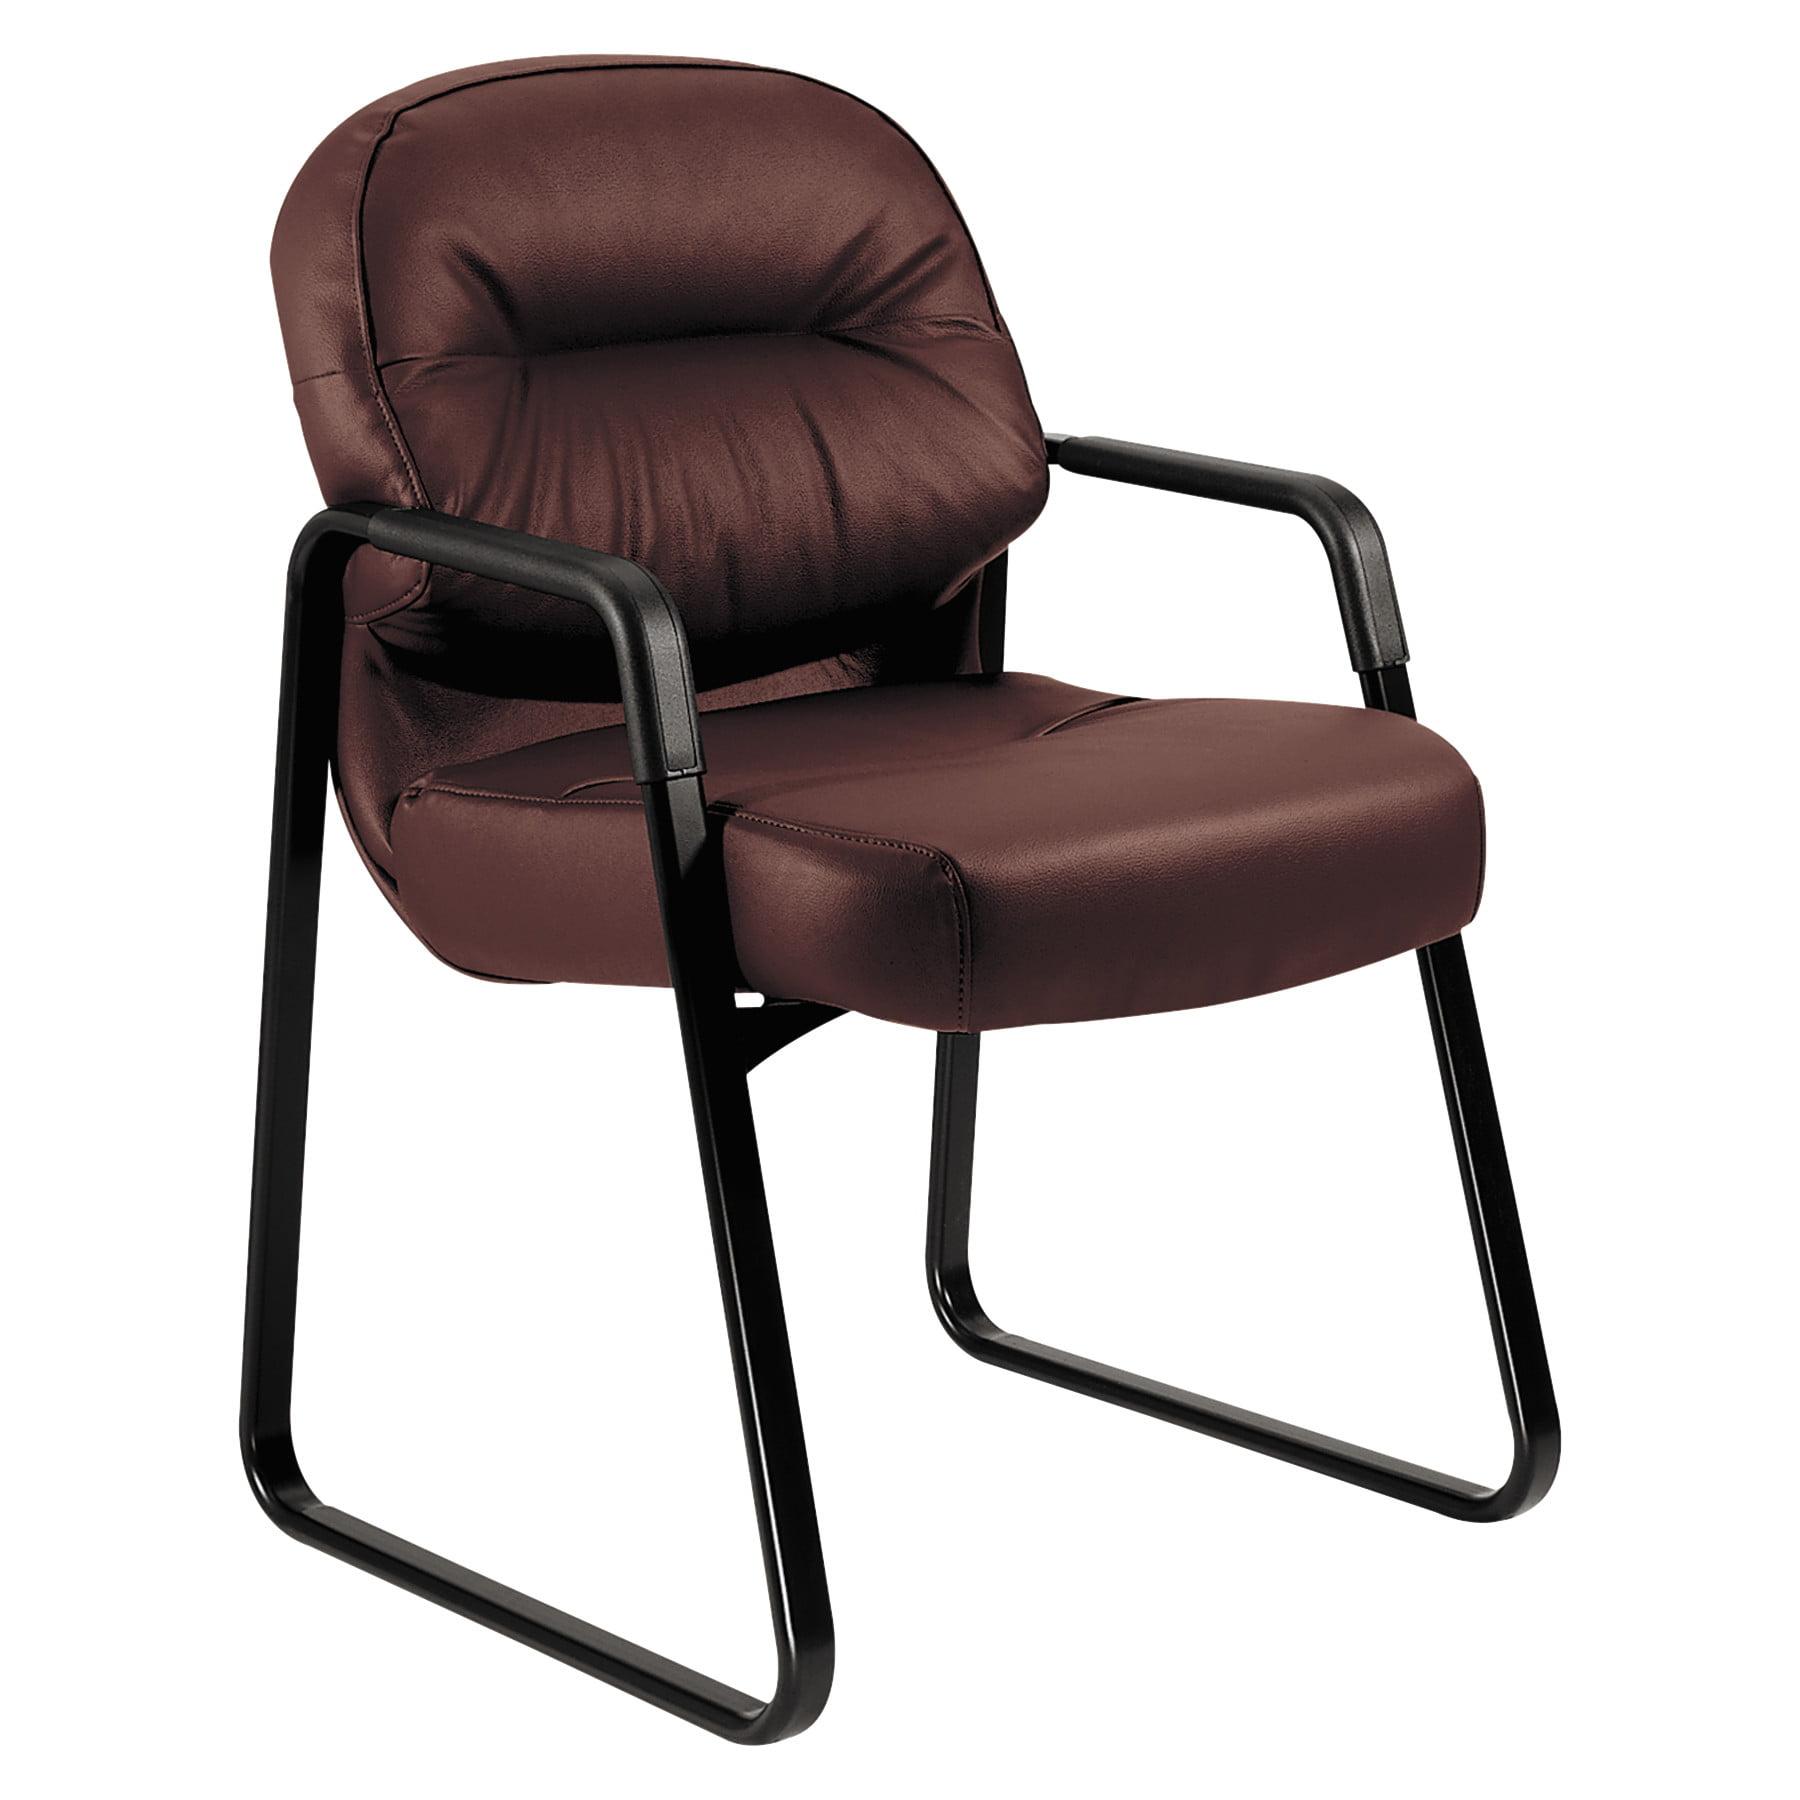 HON, HON2093SR11T, Pillow-Soft Guest Chair, Leather, 1 Each